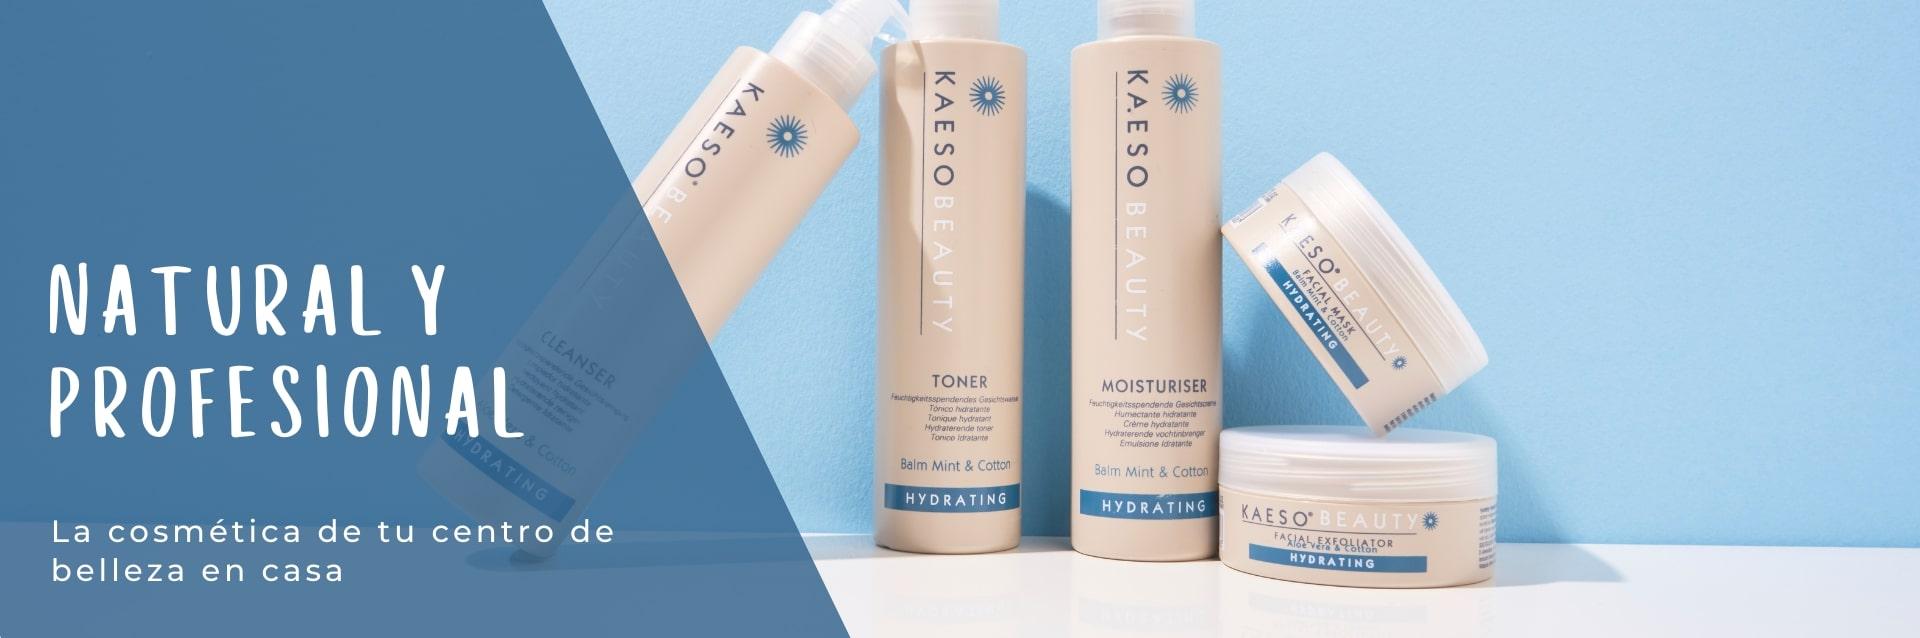 cosmetica natural y profesional